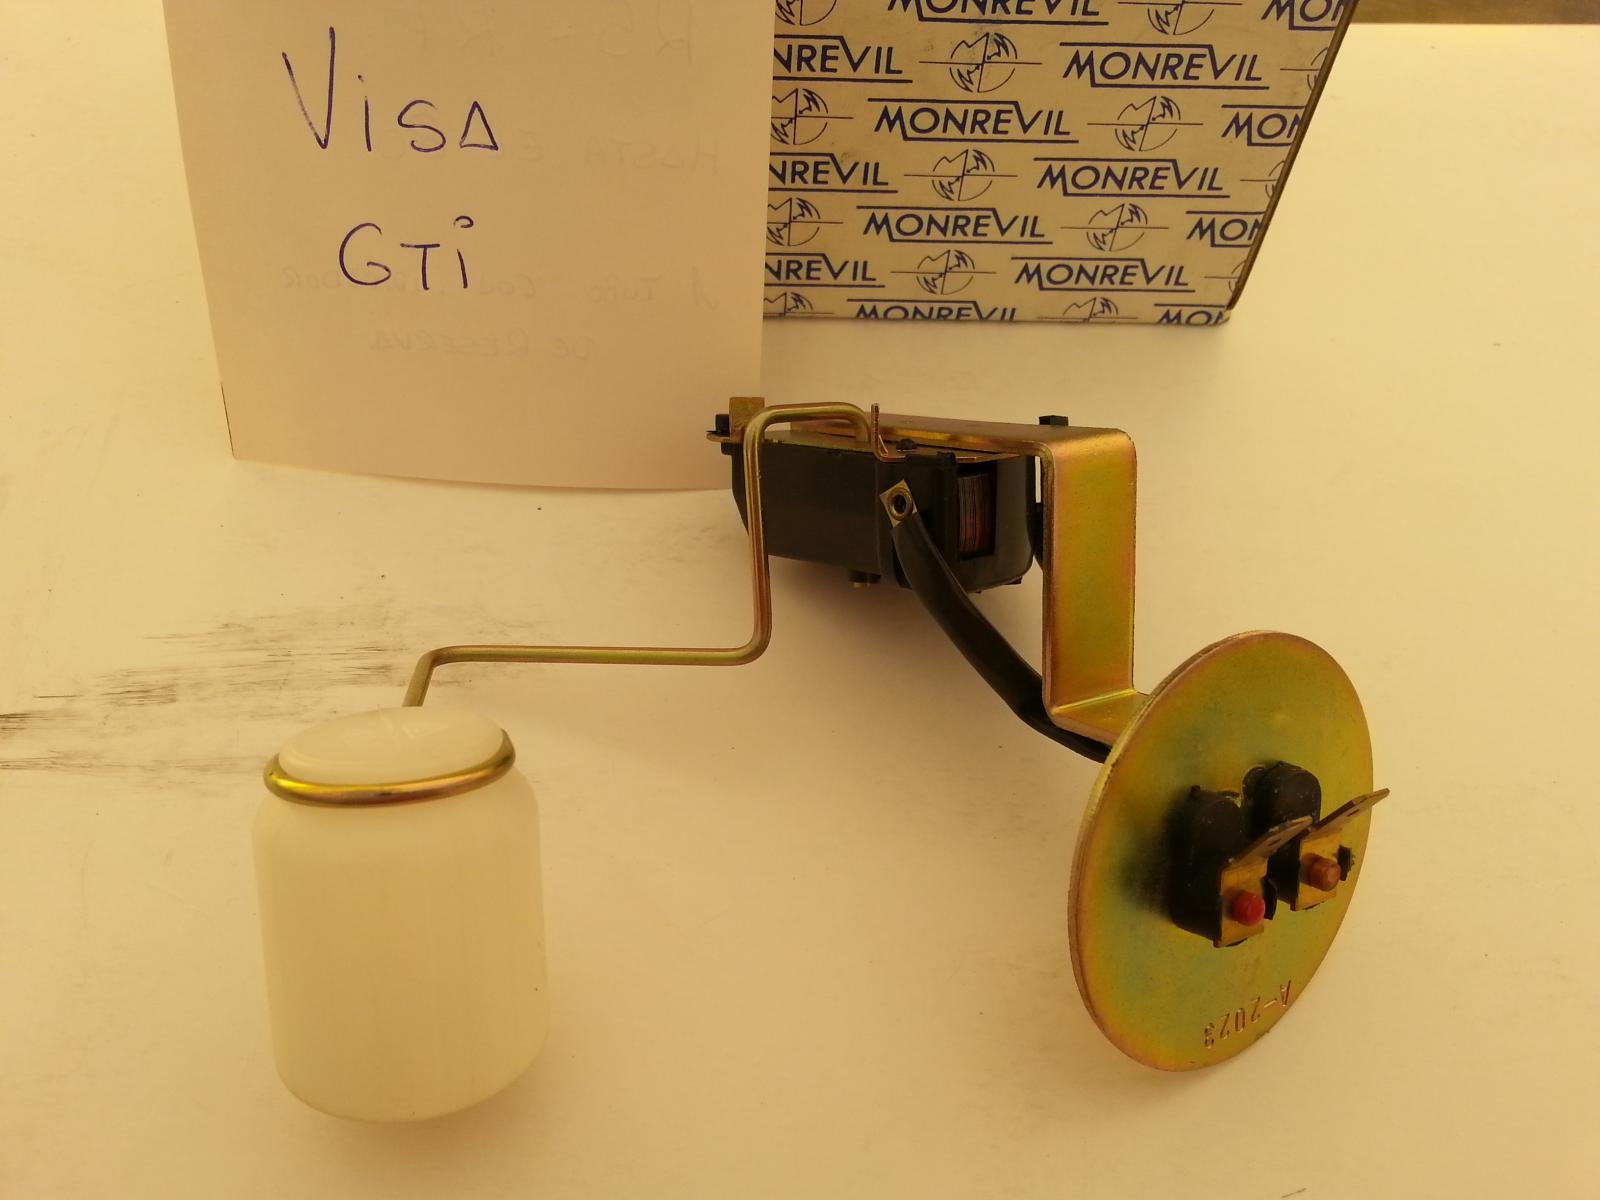 Aforador Citroen Visa GTI